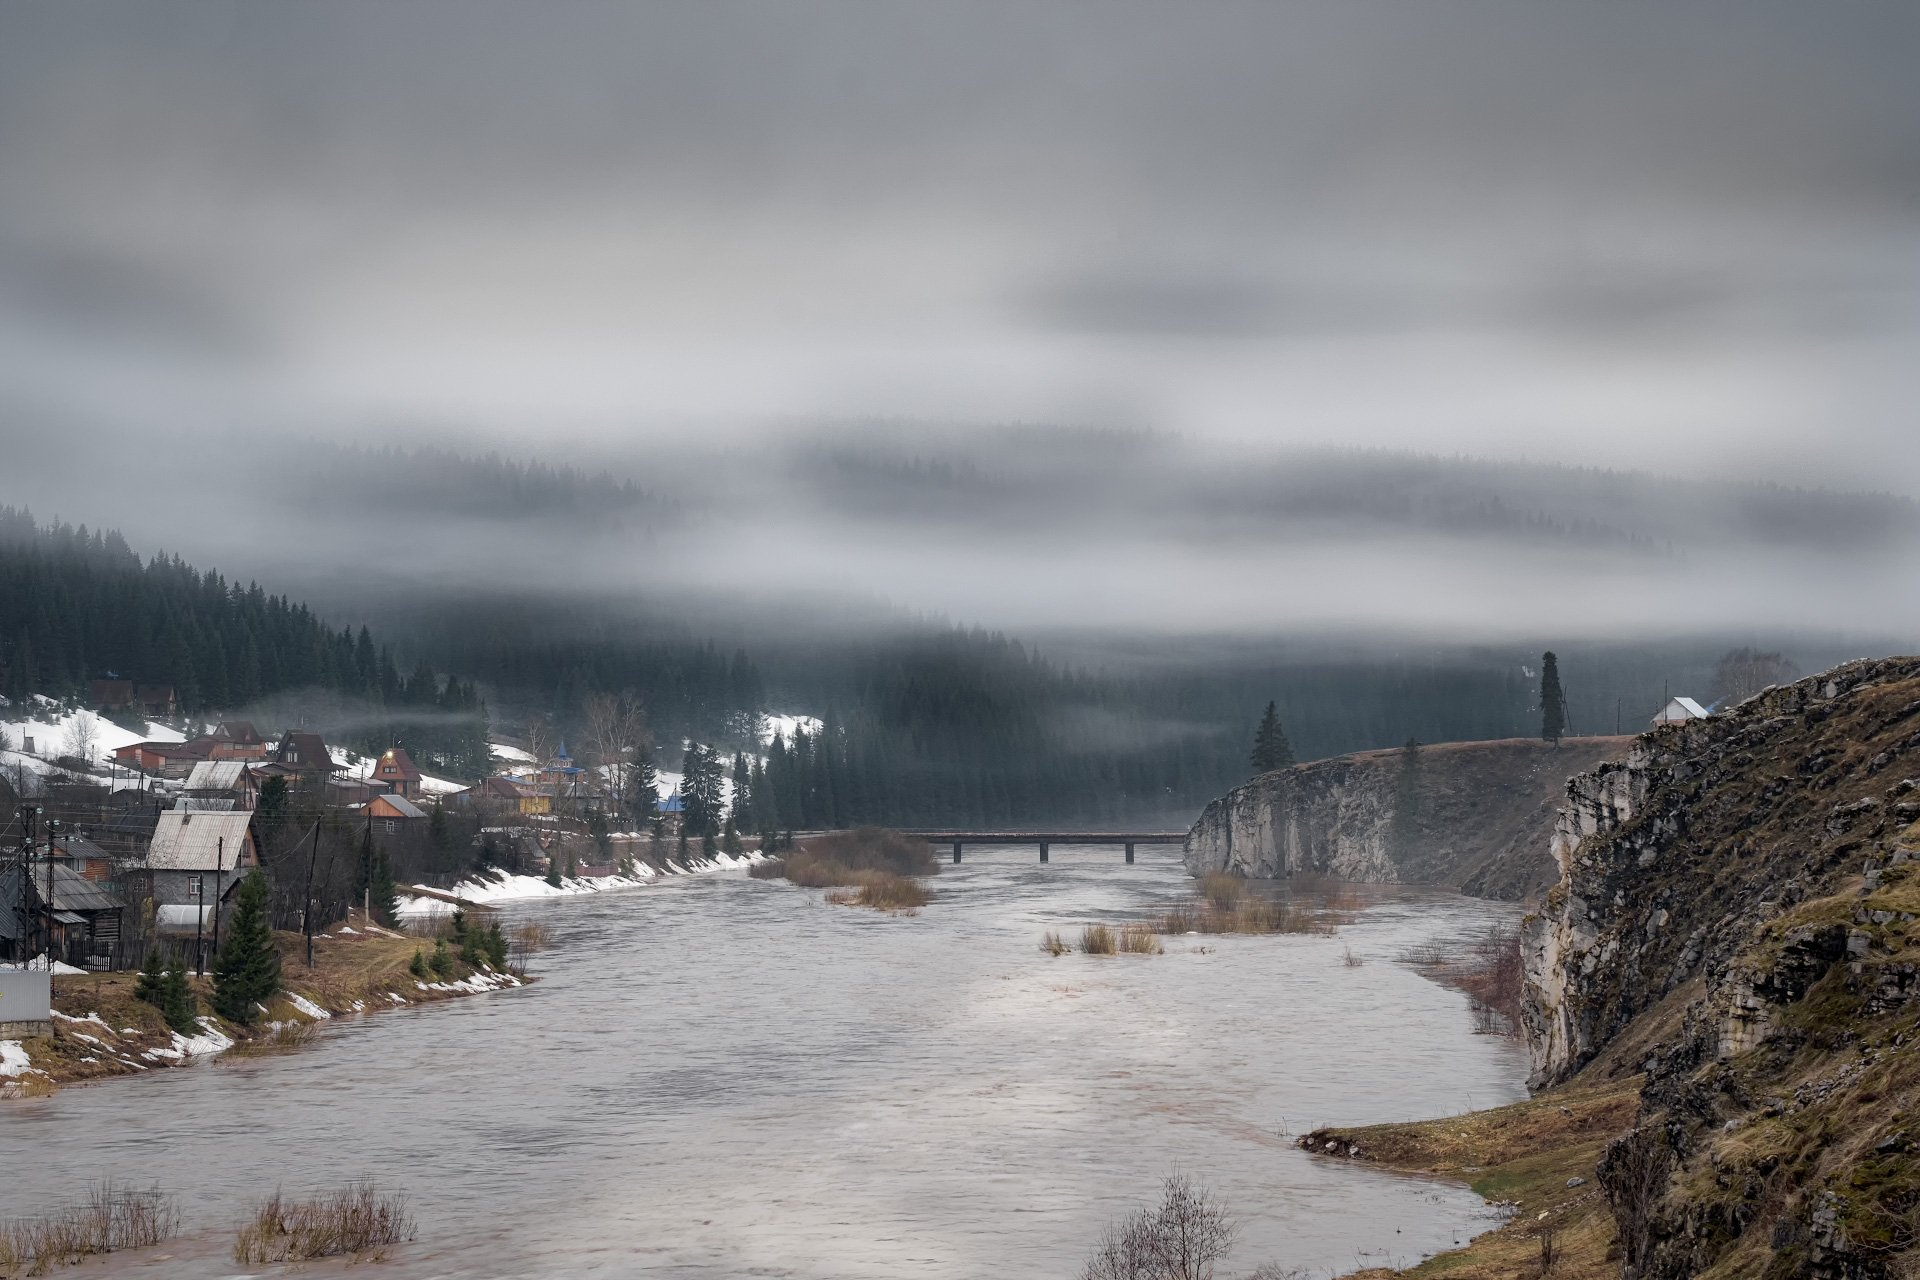 кусье-александровский, поселок, урал, пермский край, койва, река, утро, туман, облака, паводок, Андрей Чиж